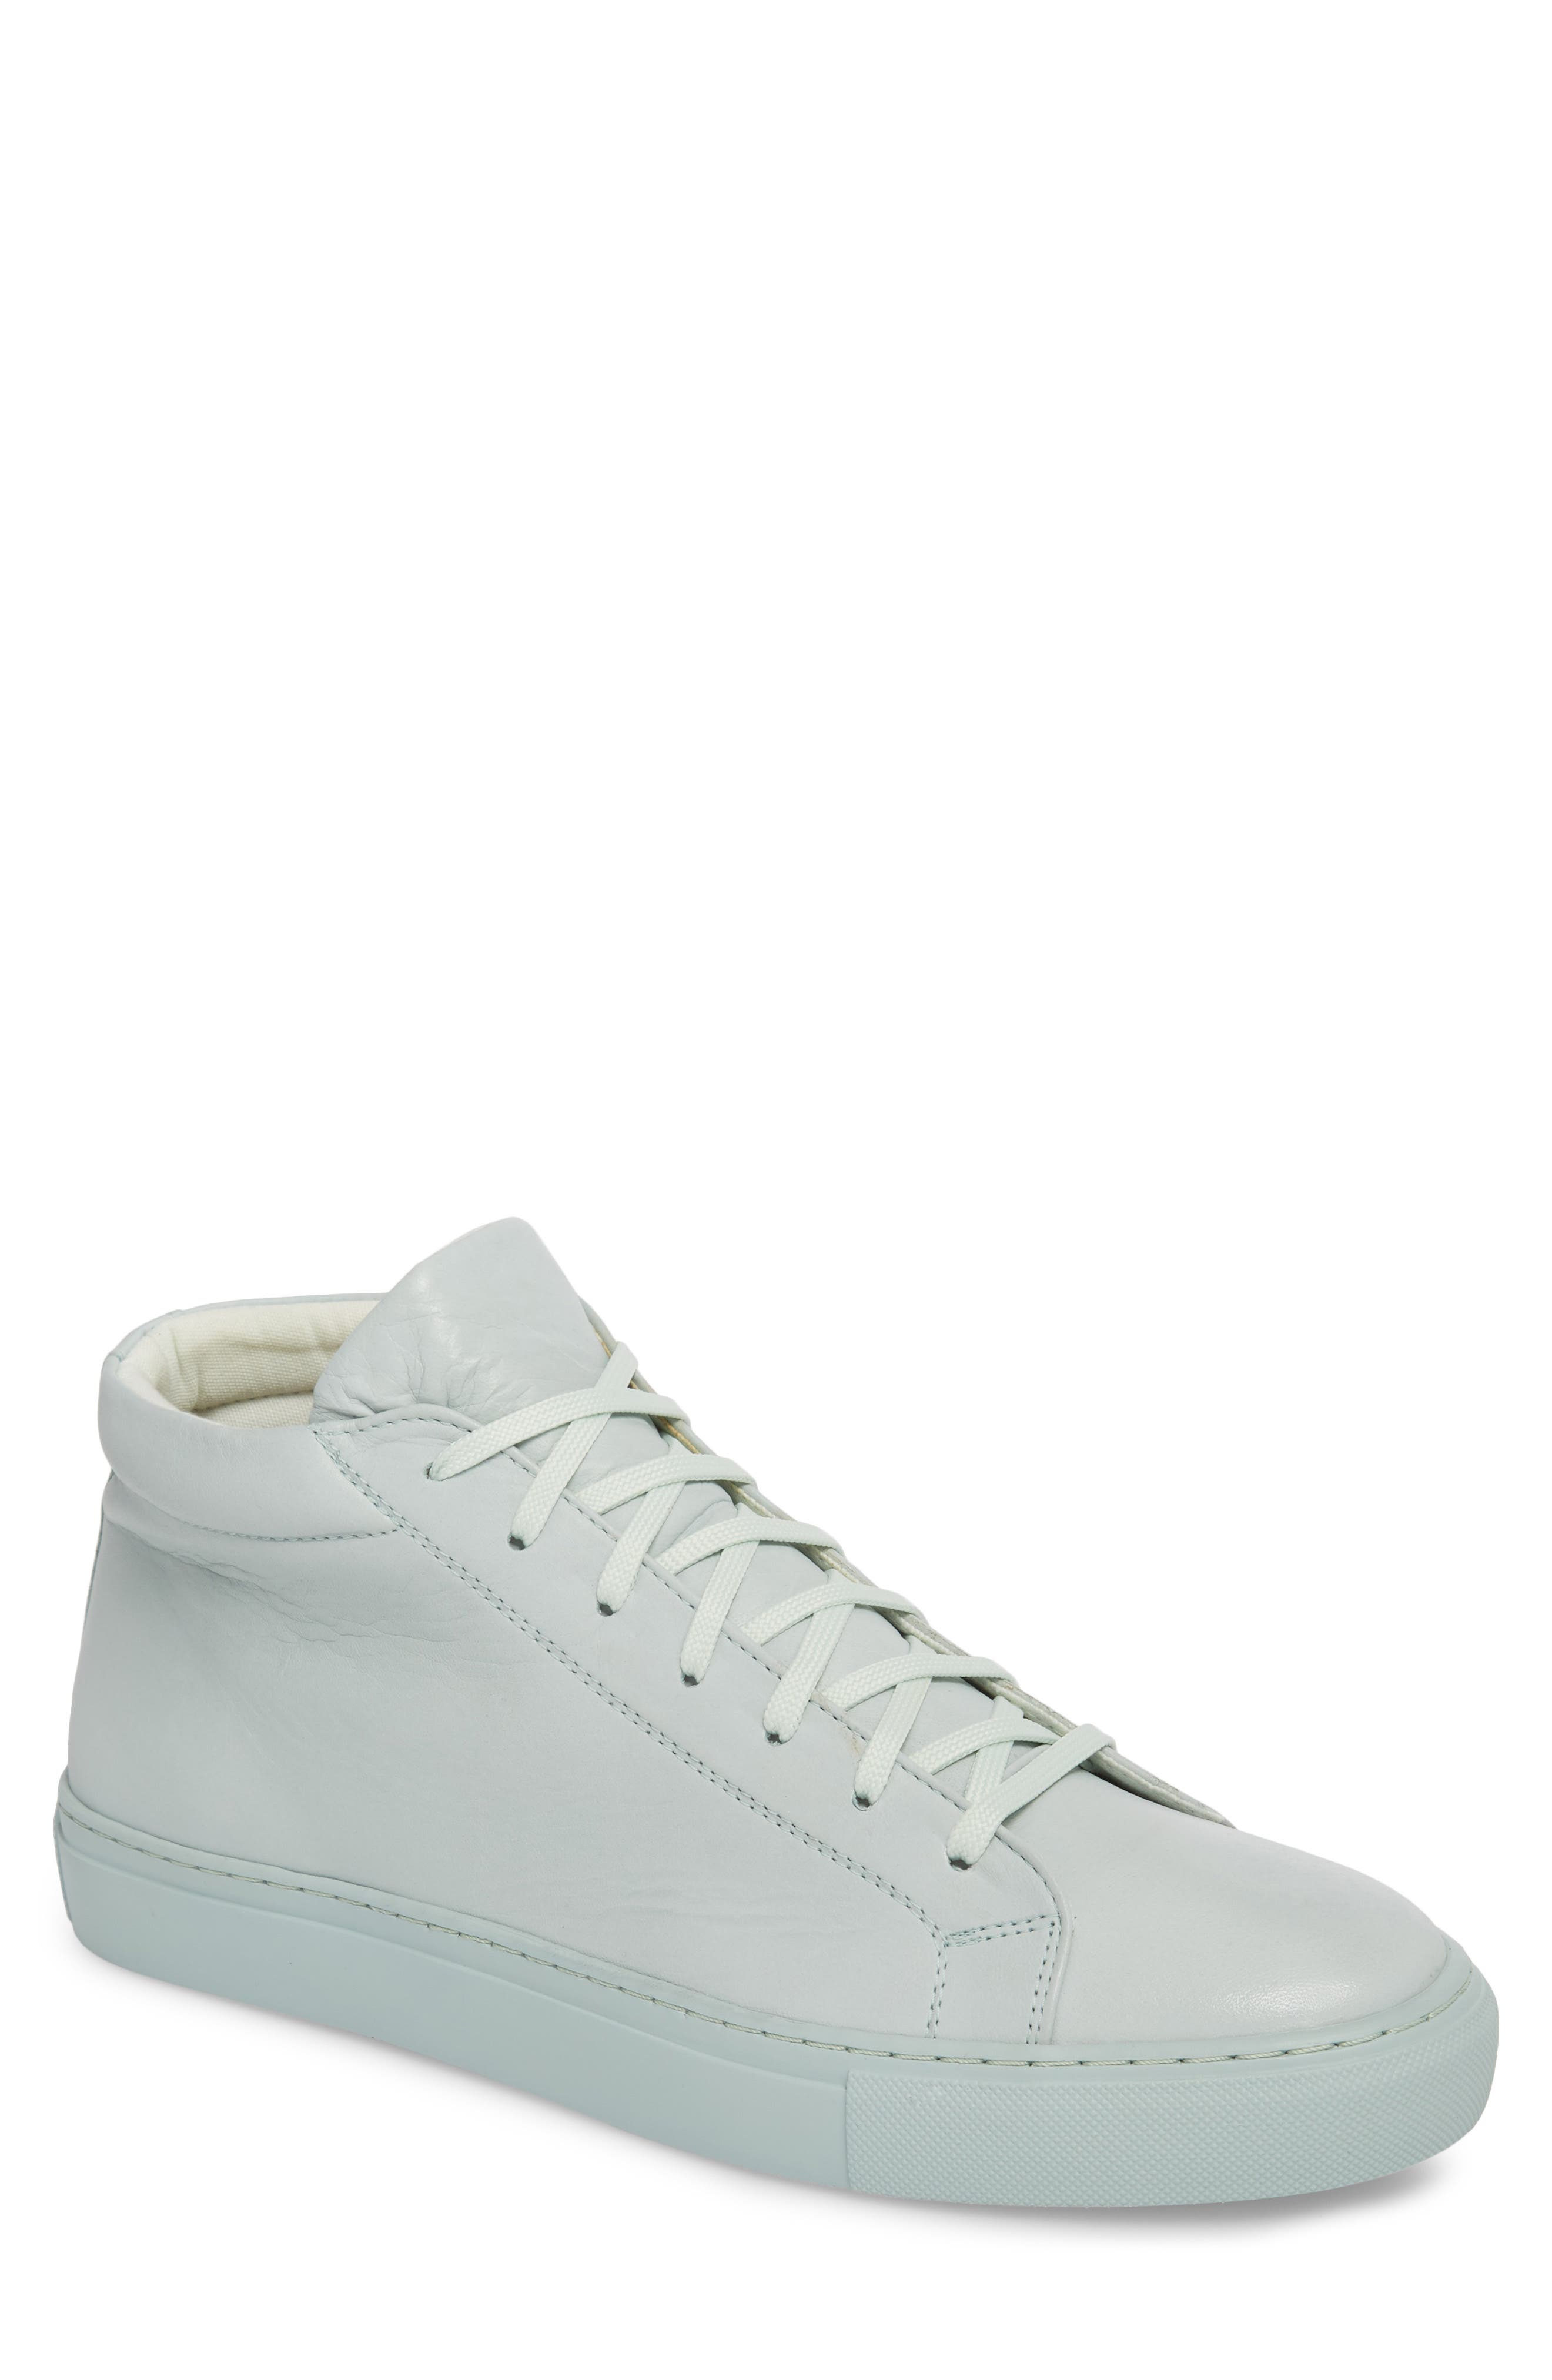 Lexington Mid Top Sneaker,                             Main thumbnail 1, color,                             303